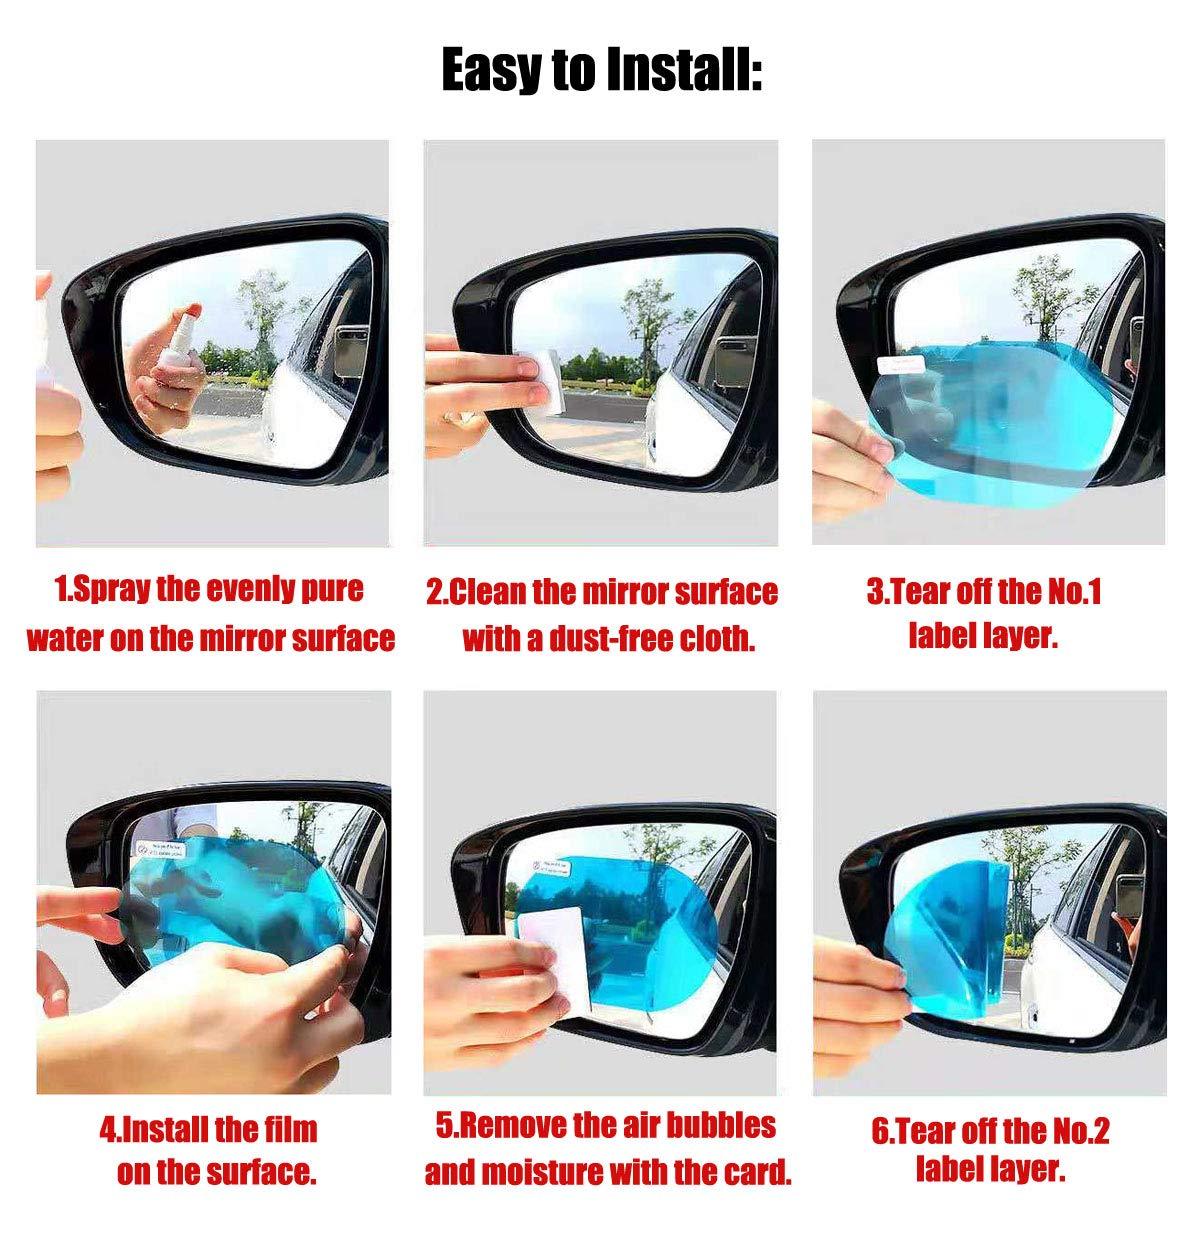 Ymwave 4pcs Car Rearview Mirror Protective Films Anti Fog Film Waterproof Transparent Film Anti Fog Anti-glare Anti Stain for Car Motorcycle